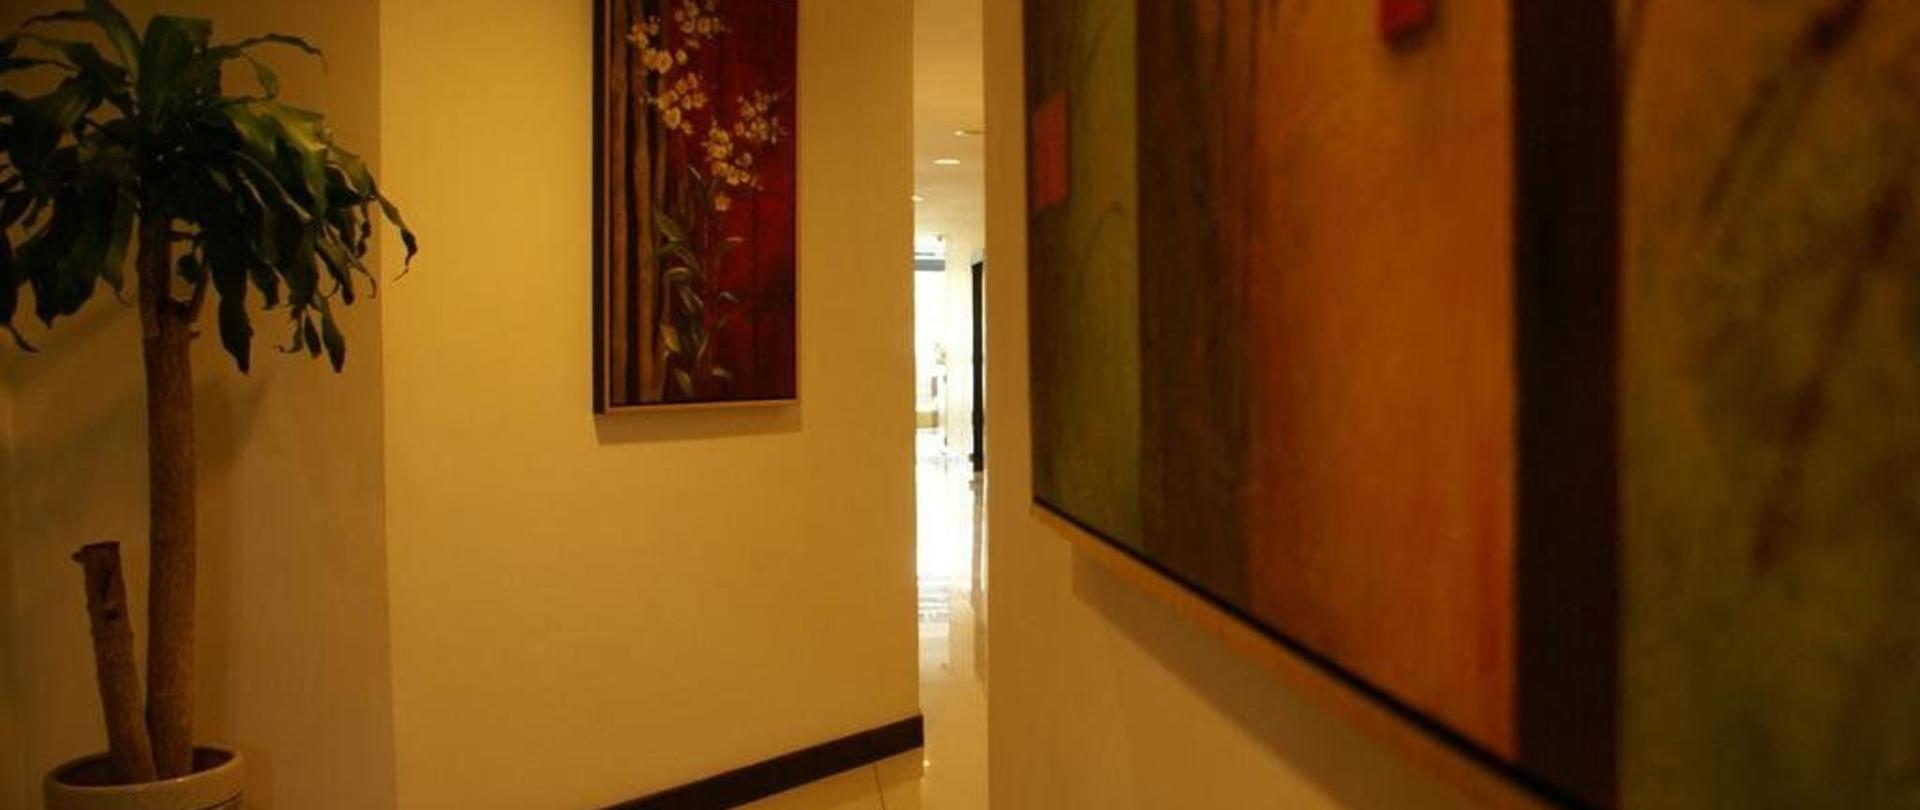 interior-view8.jpg